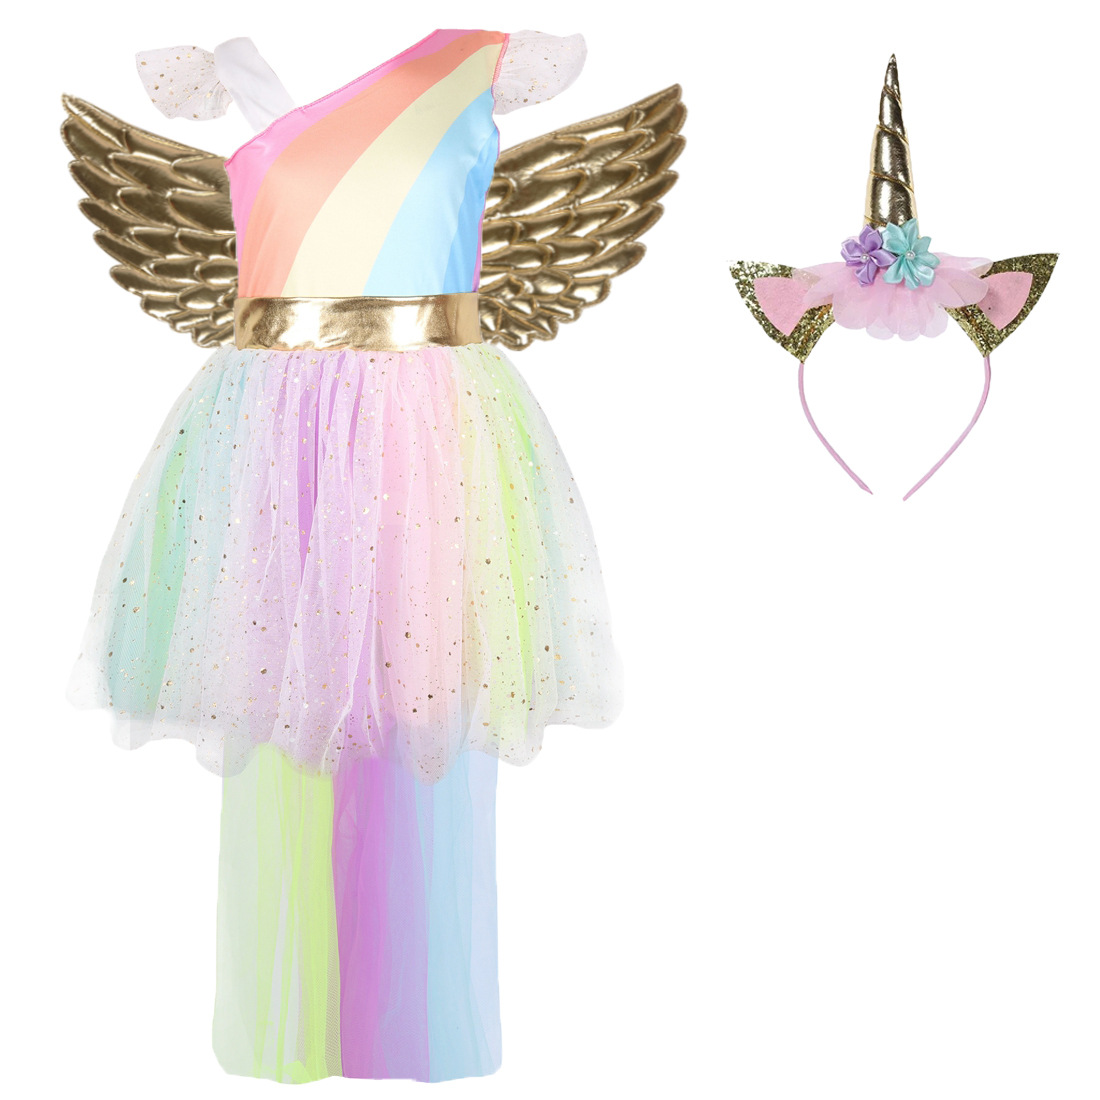 New Unicorn Halloween Costumes For Kids Girls Princess Dresses Mesh Elegant Dress With Gold Headband Wings Carnival Party Dress